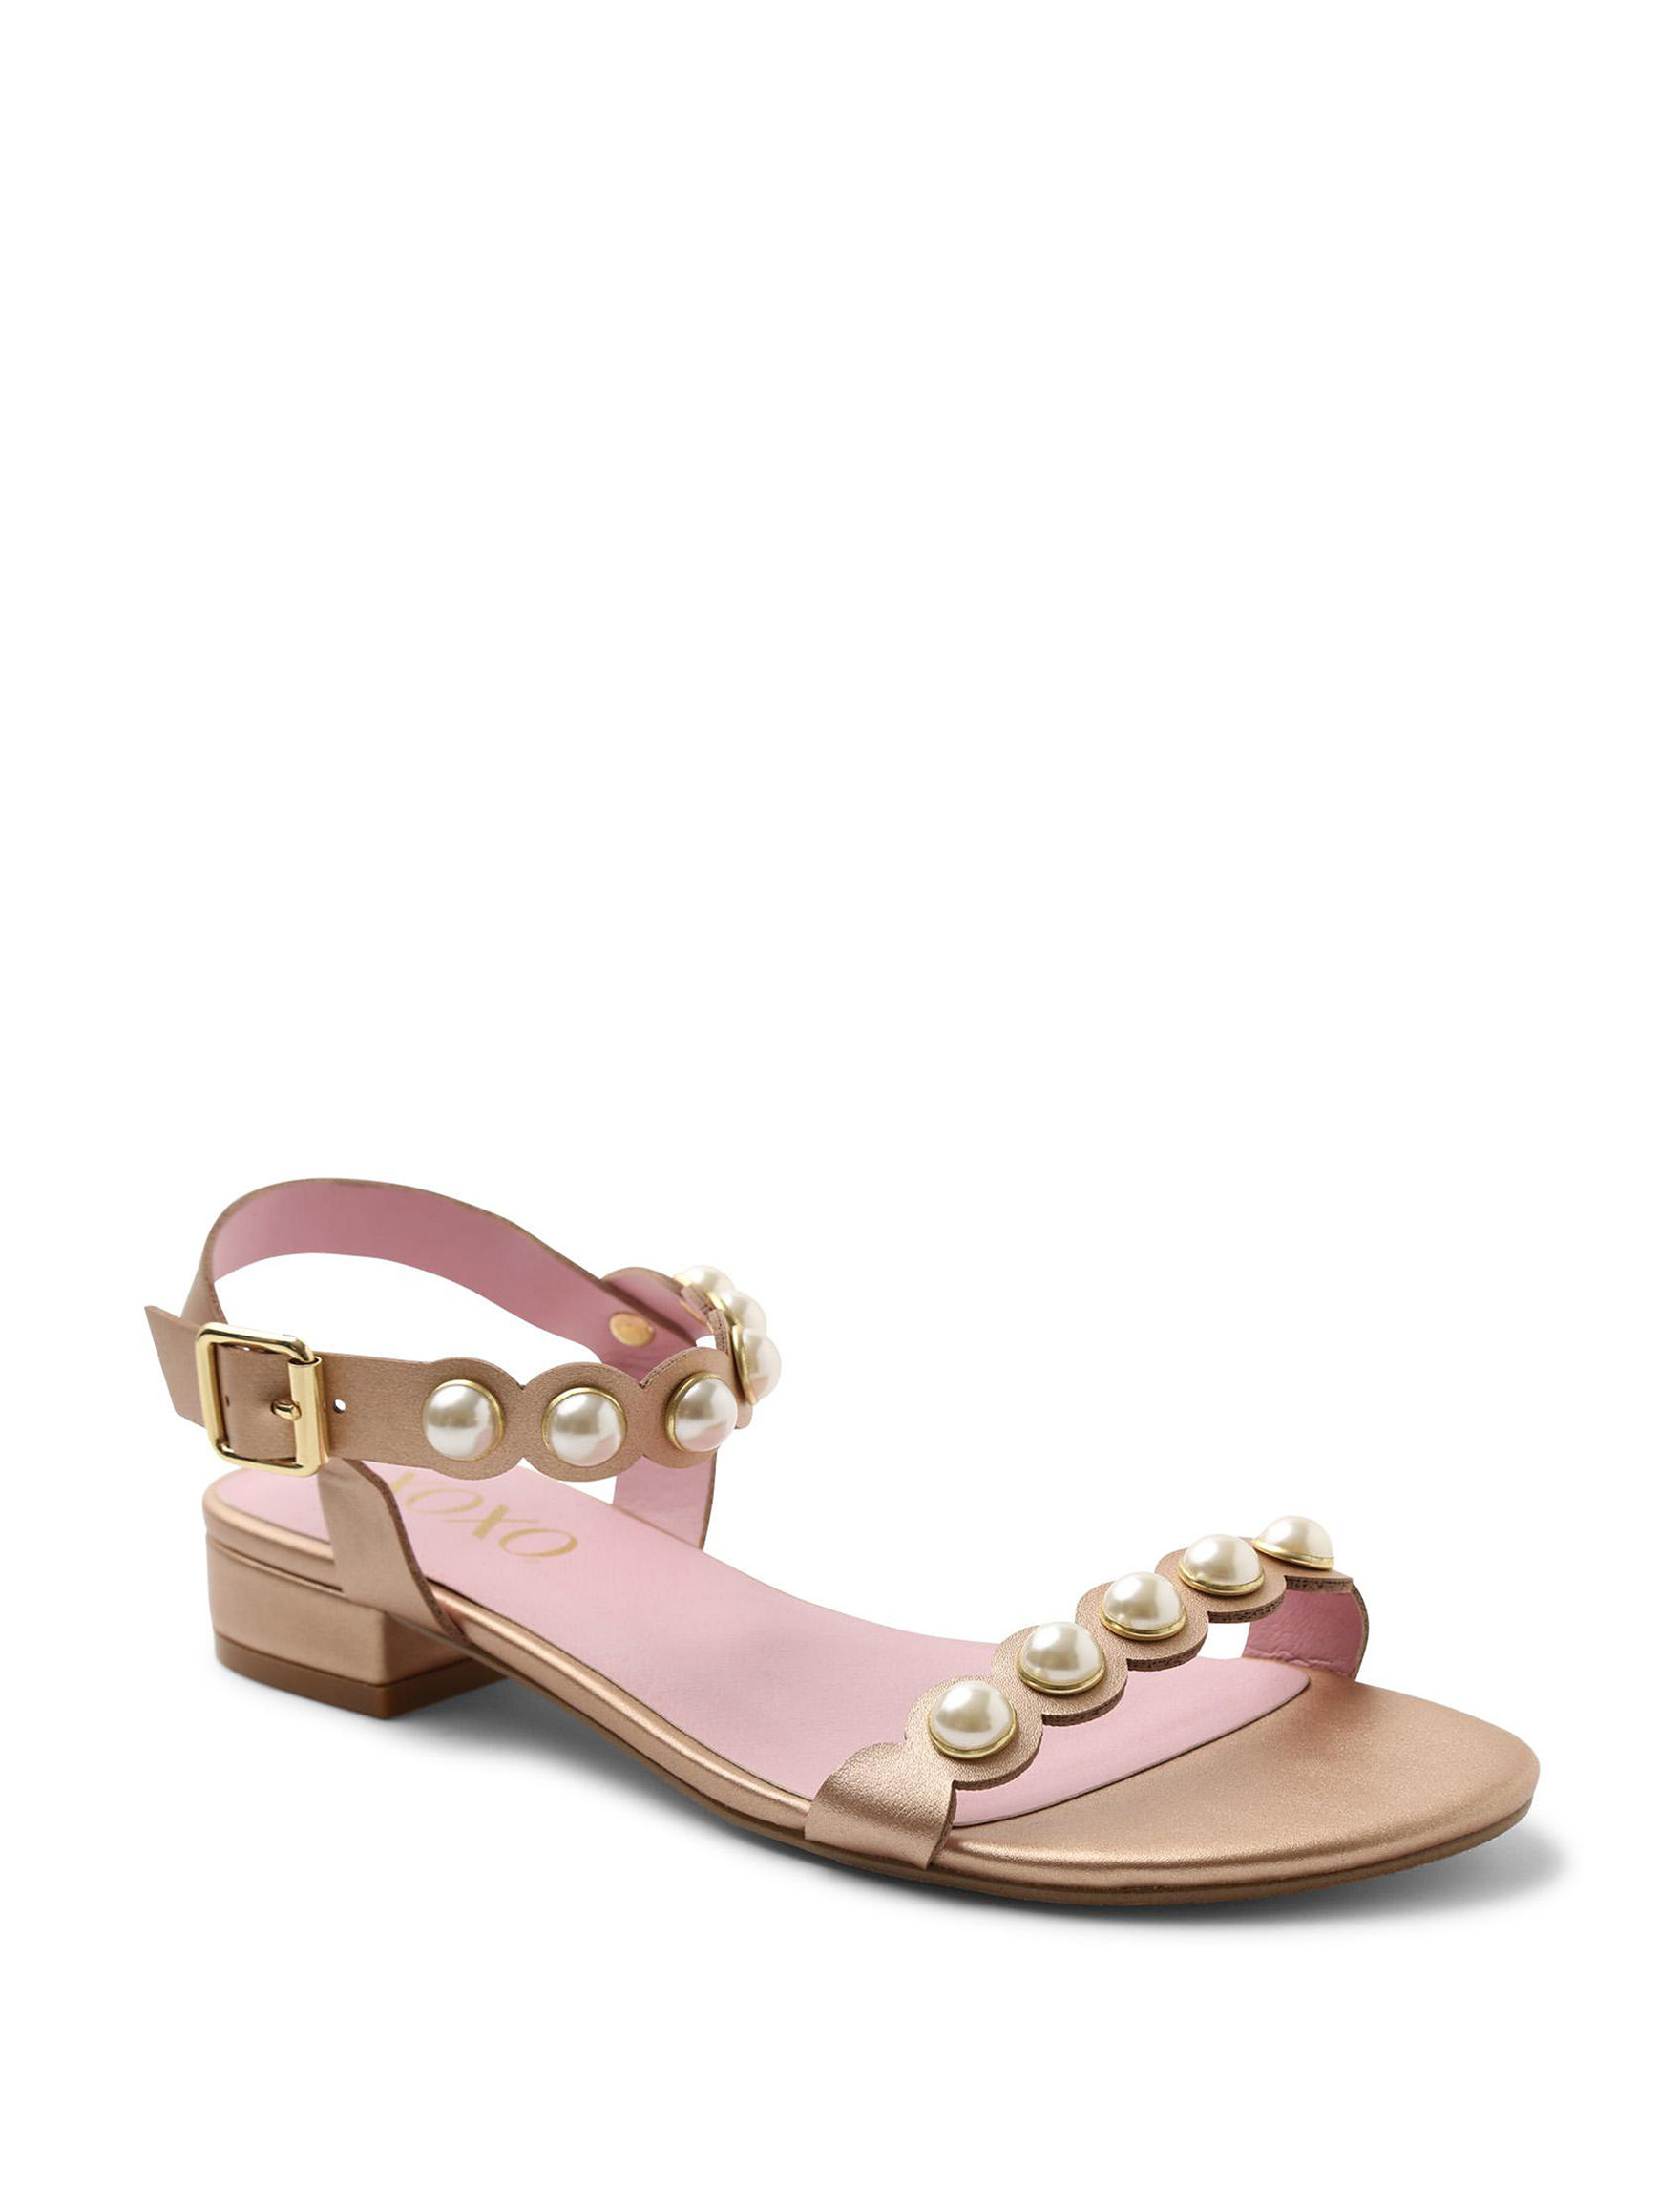 XOXO Rose Gold Flat Sandals